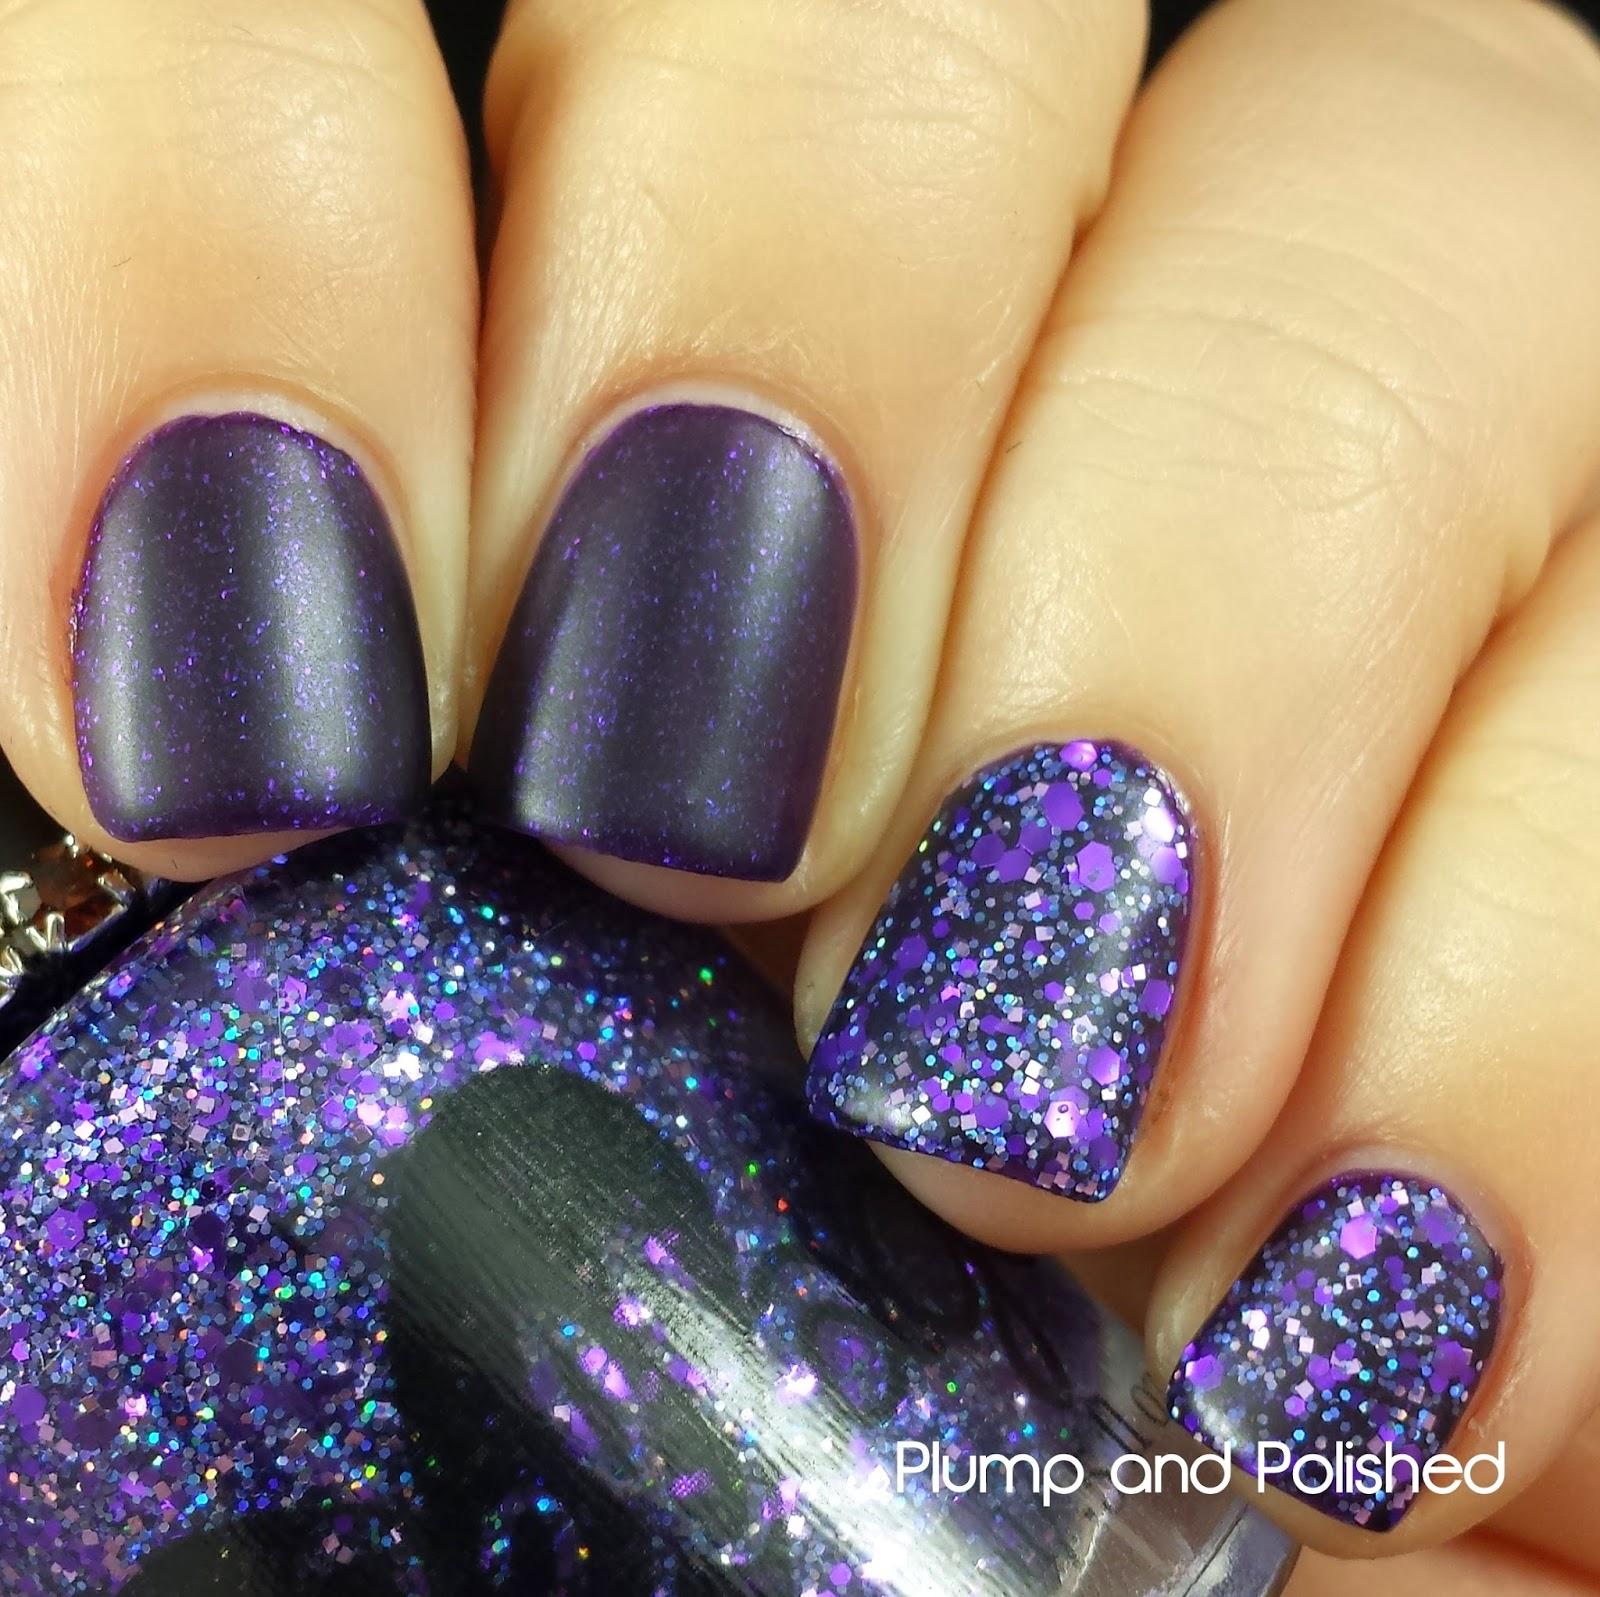 ellagee - Sparkling Gemstones: Glimmering Amethyst and Crushed Amethyst